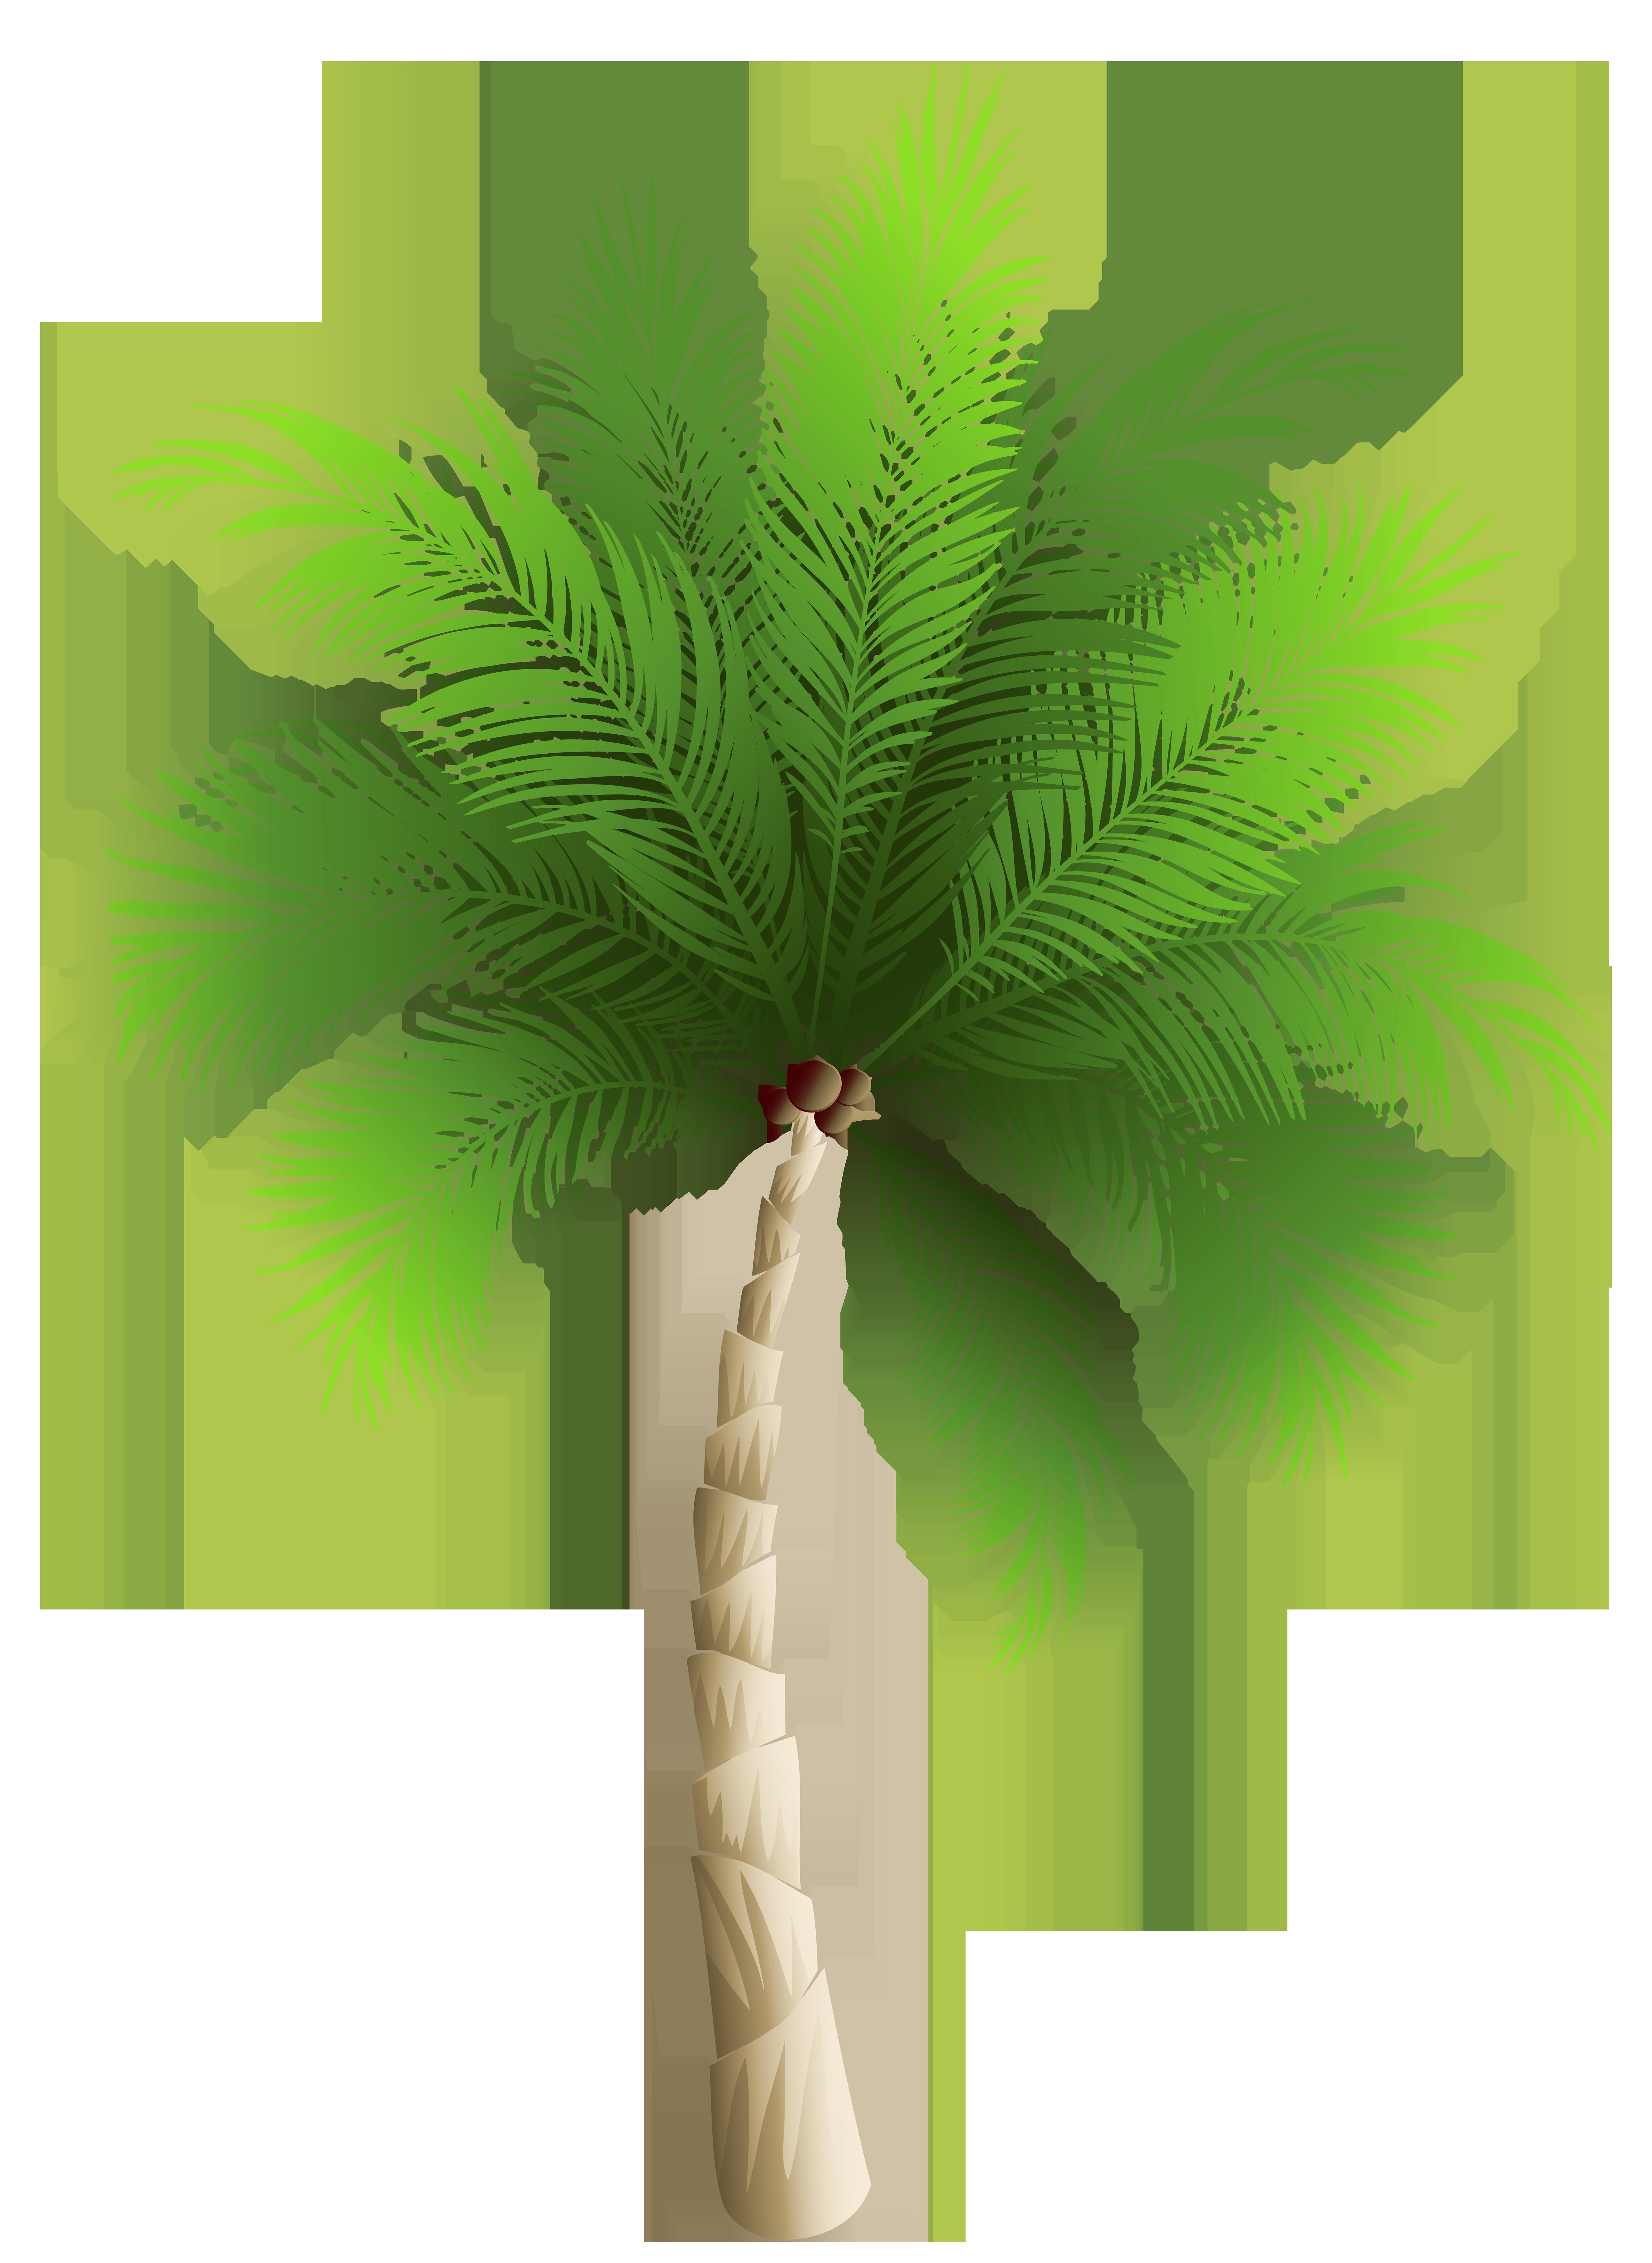 Palm Tree Png Clipart Image Ilustracao Botanica Flores Aquarela